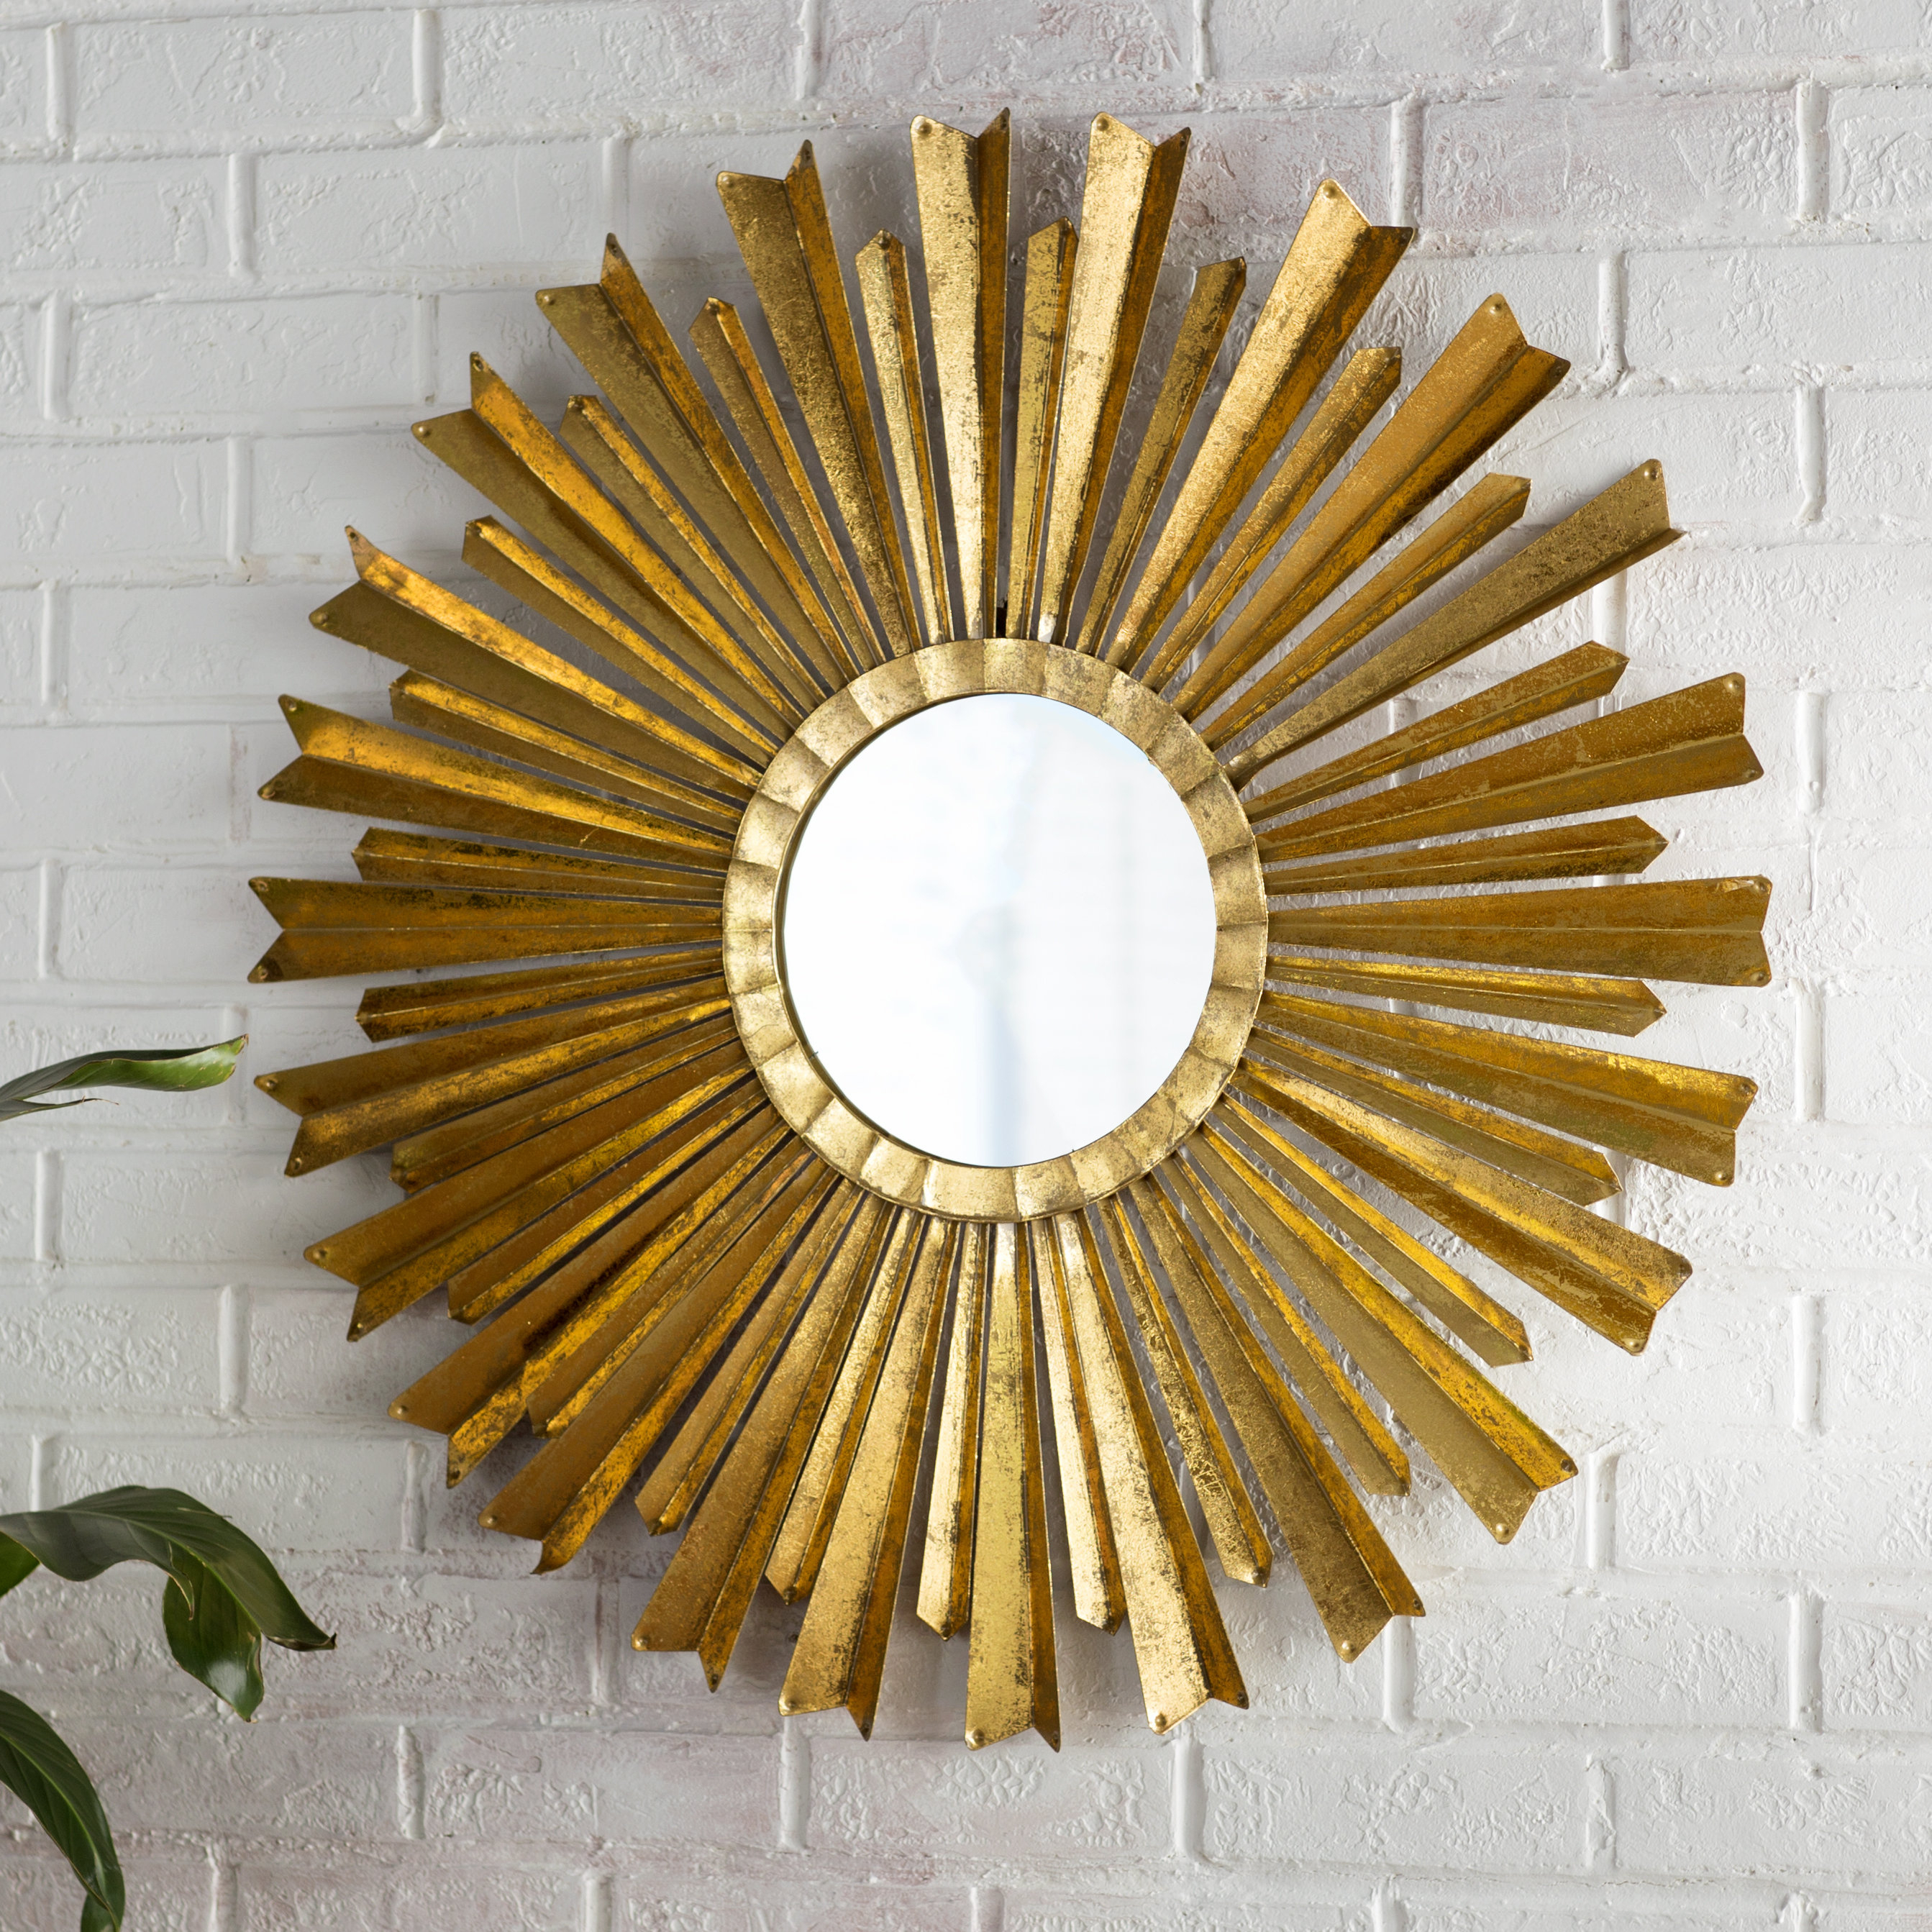 Large & Oversized Sunburst Mirrors You'll Love In 2019 | Wayfair Regarding Jarrod Sunburst Accent Mirrors (Image 13 of 20)